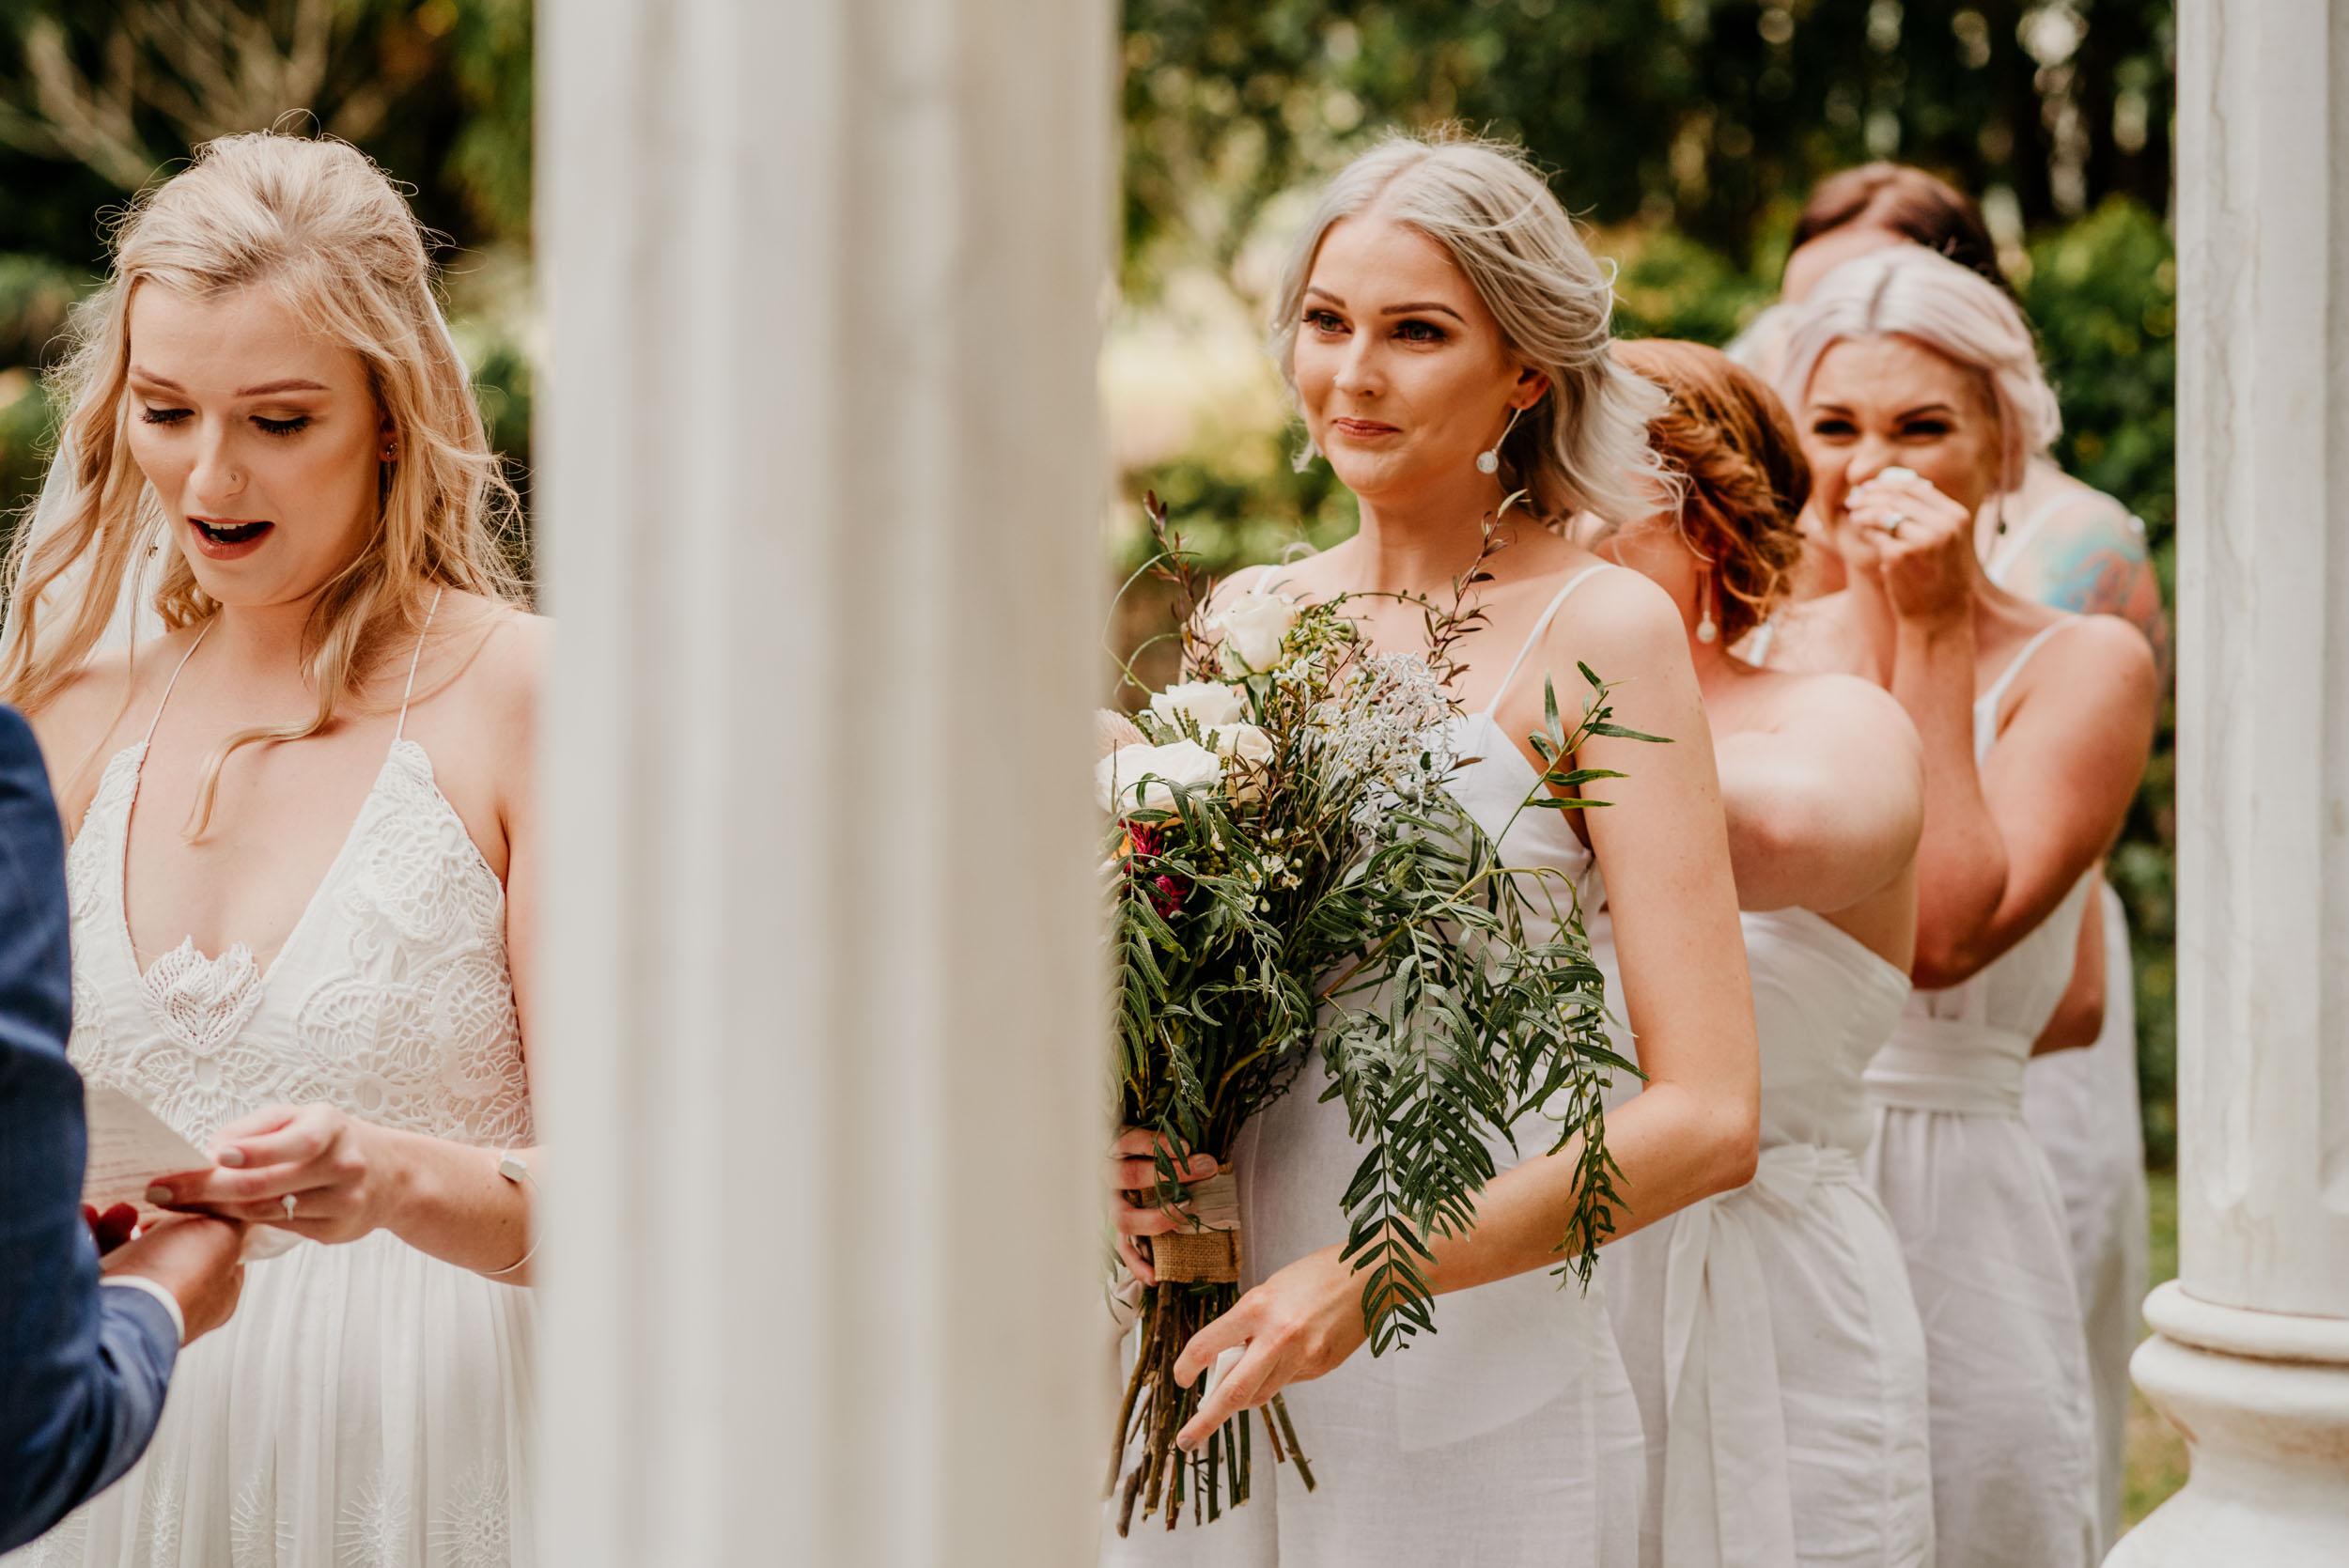 The Raw Photographer - Cairns Wedding Photographer - Laloli - Cairns Garden Wedding - Wedding Dress-40.jpg